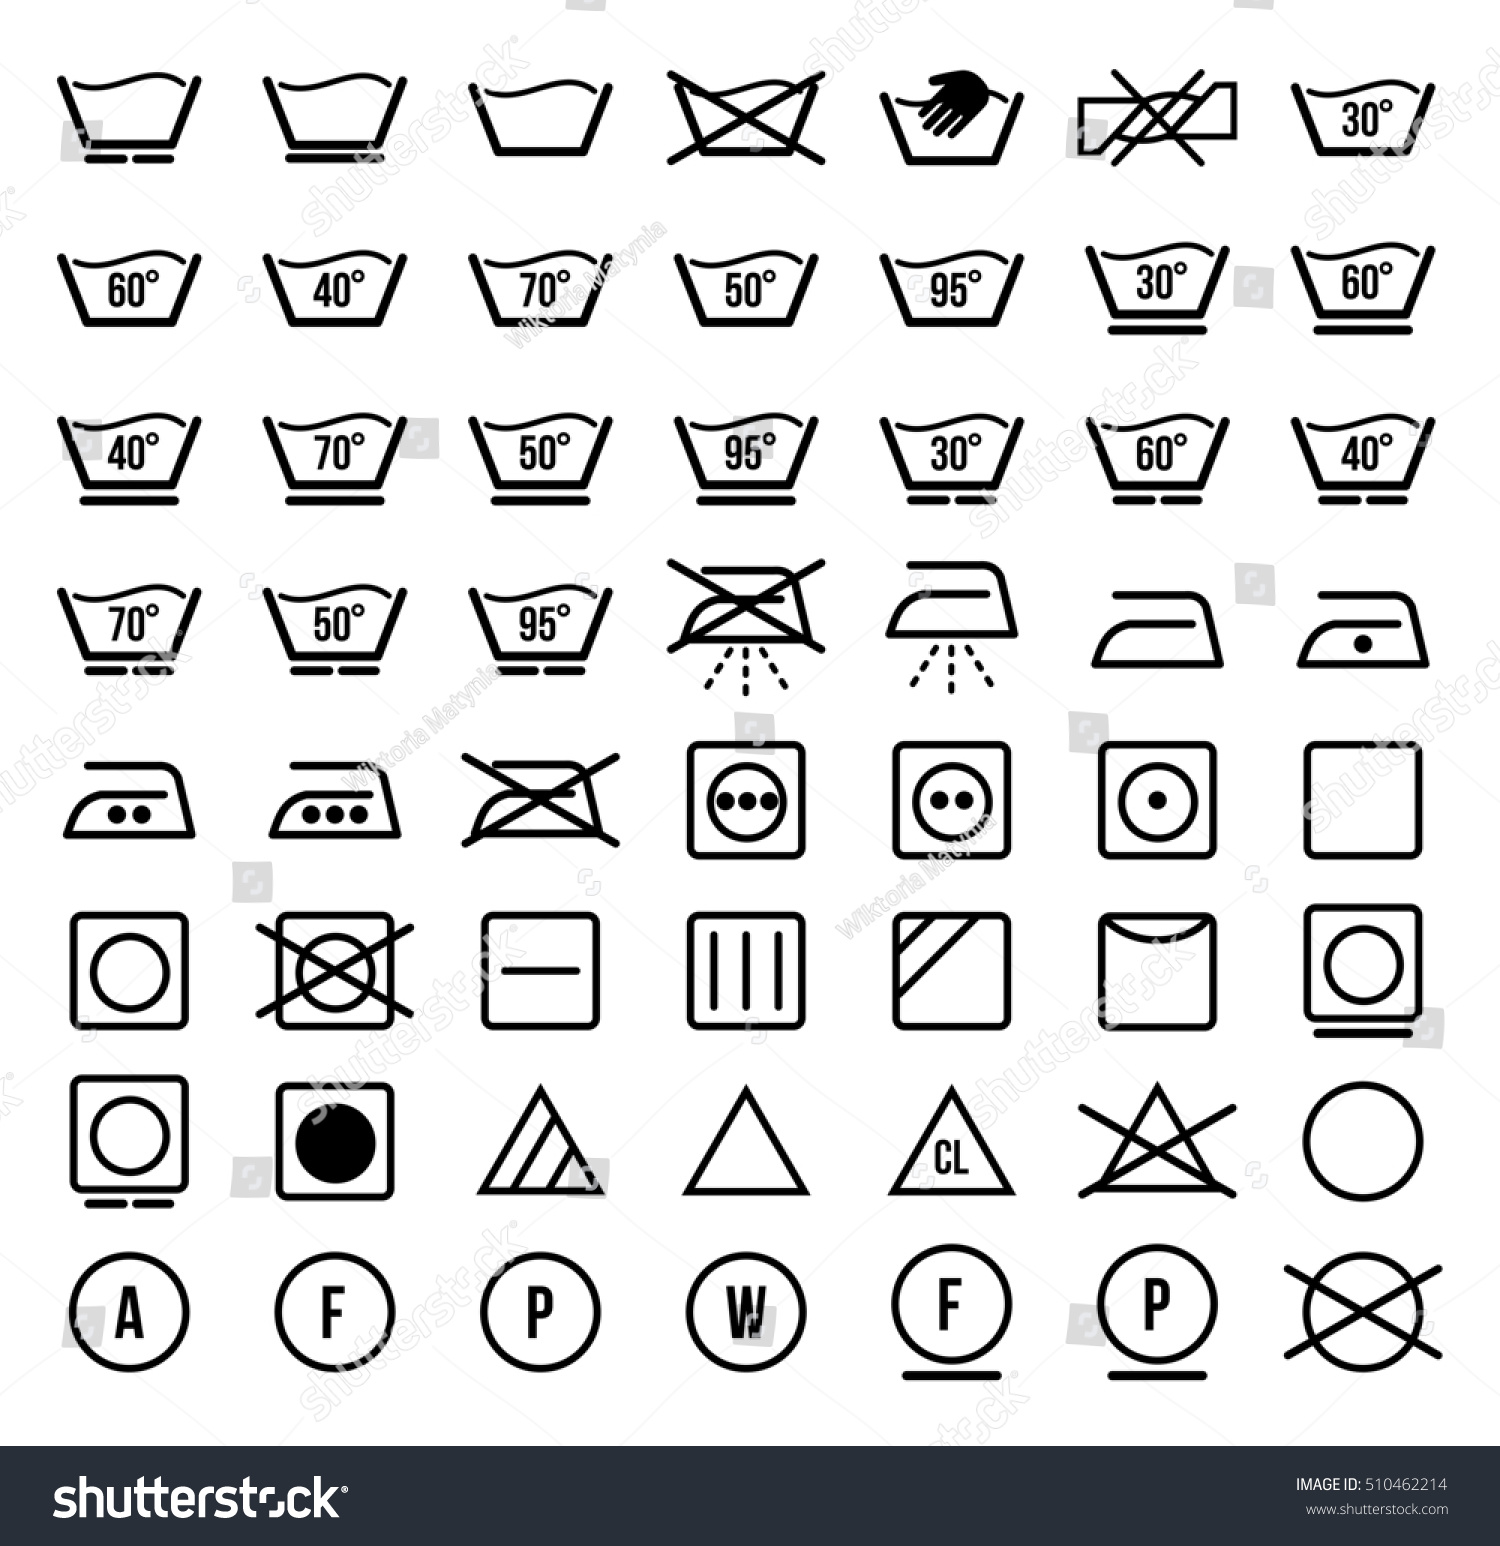 Laundry Symbols Icons Set Stock Illustration 510462214 Shutterstock